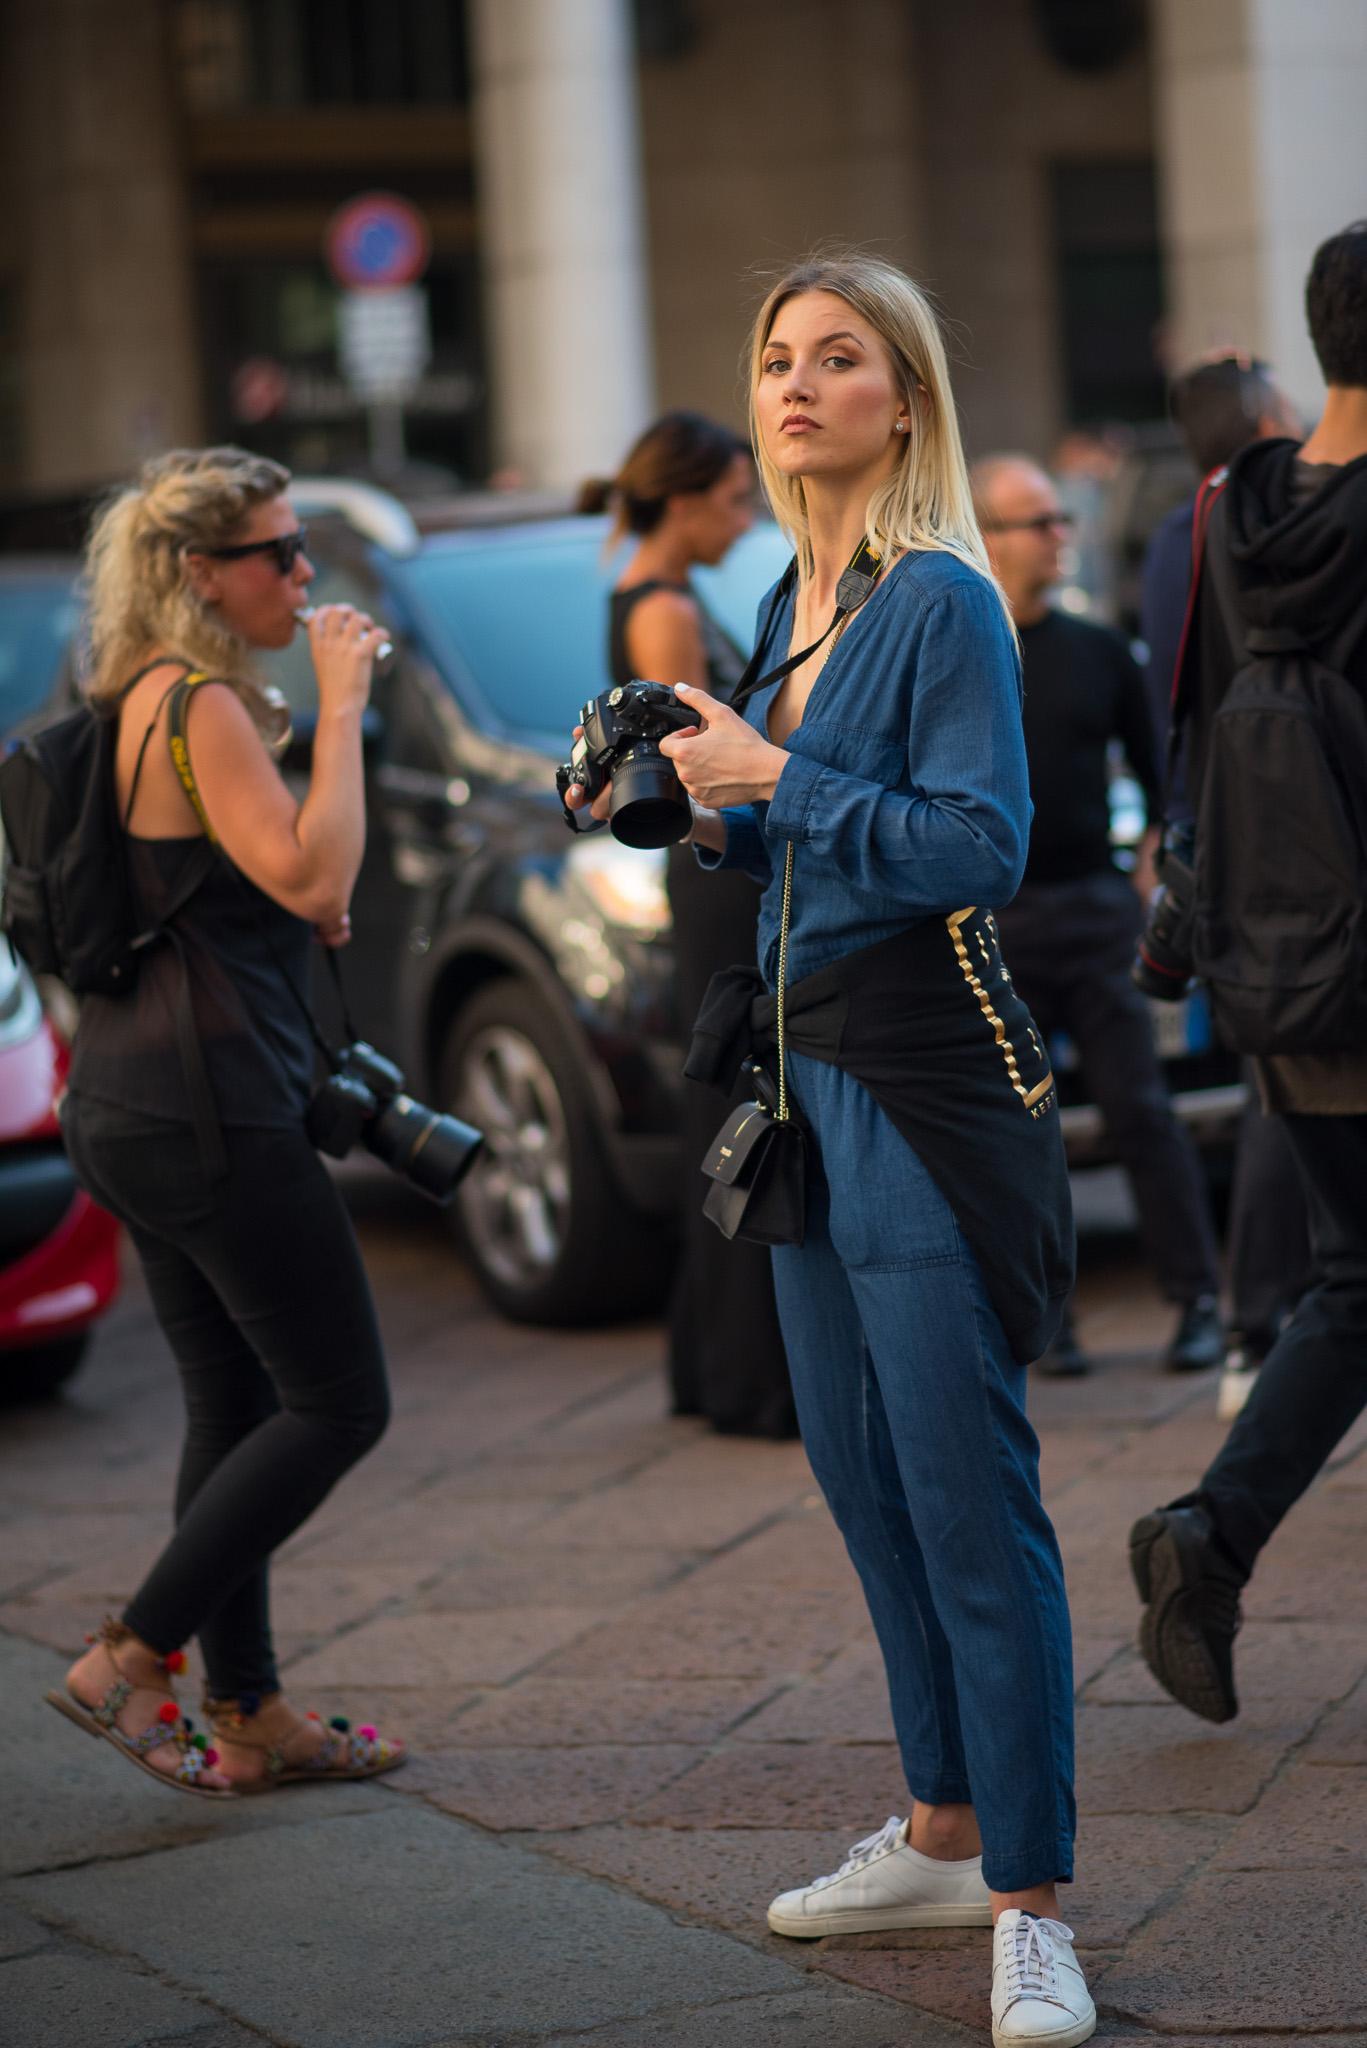 malin-lagerqvist_-salvatore-ferragamo_milan-fashion-week_sept-2016_photography-annika-lagerqvist_www-annikasomething-com-3